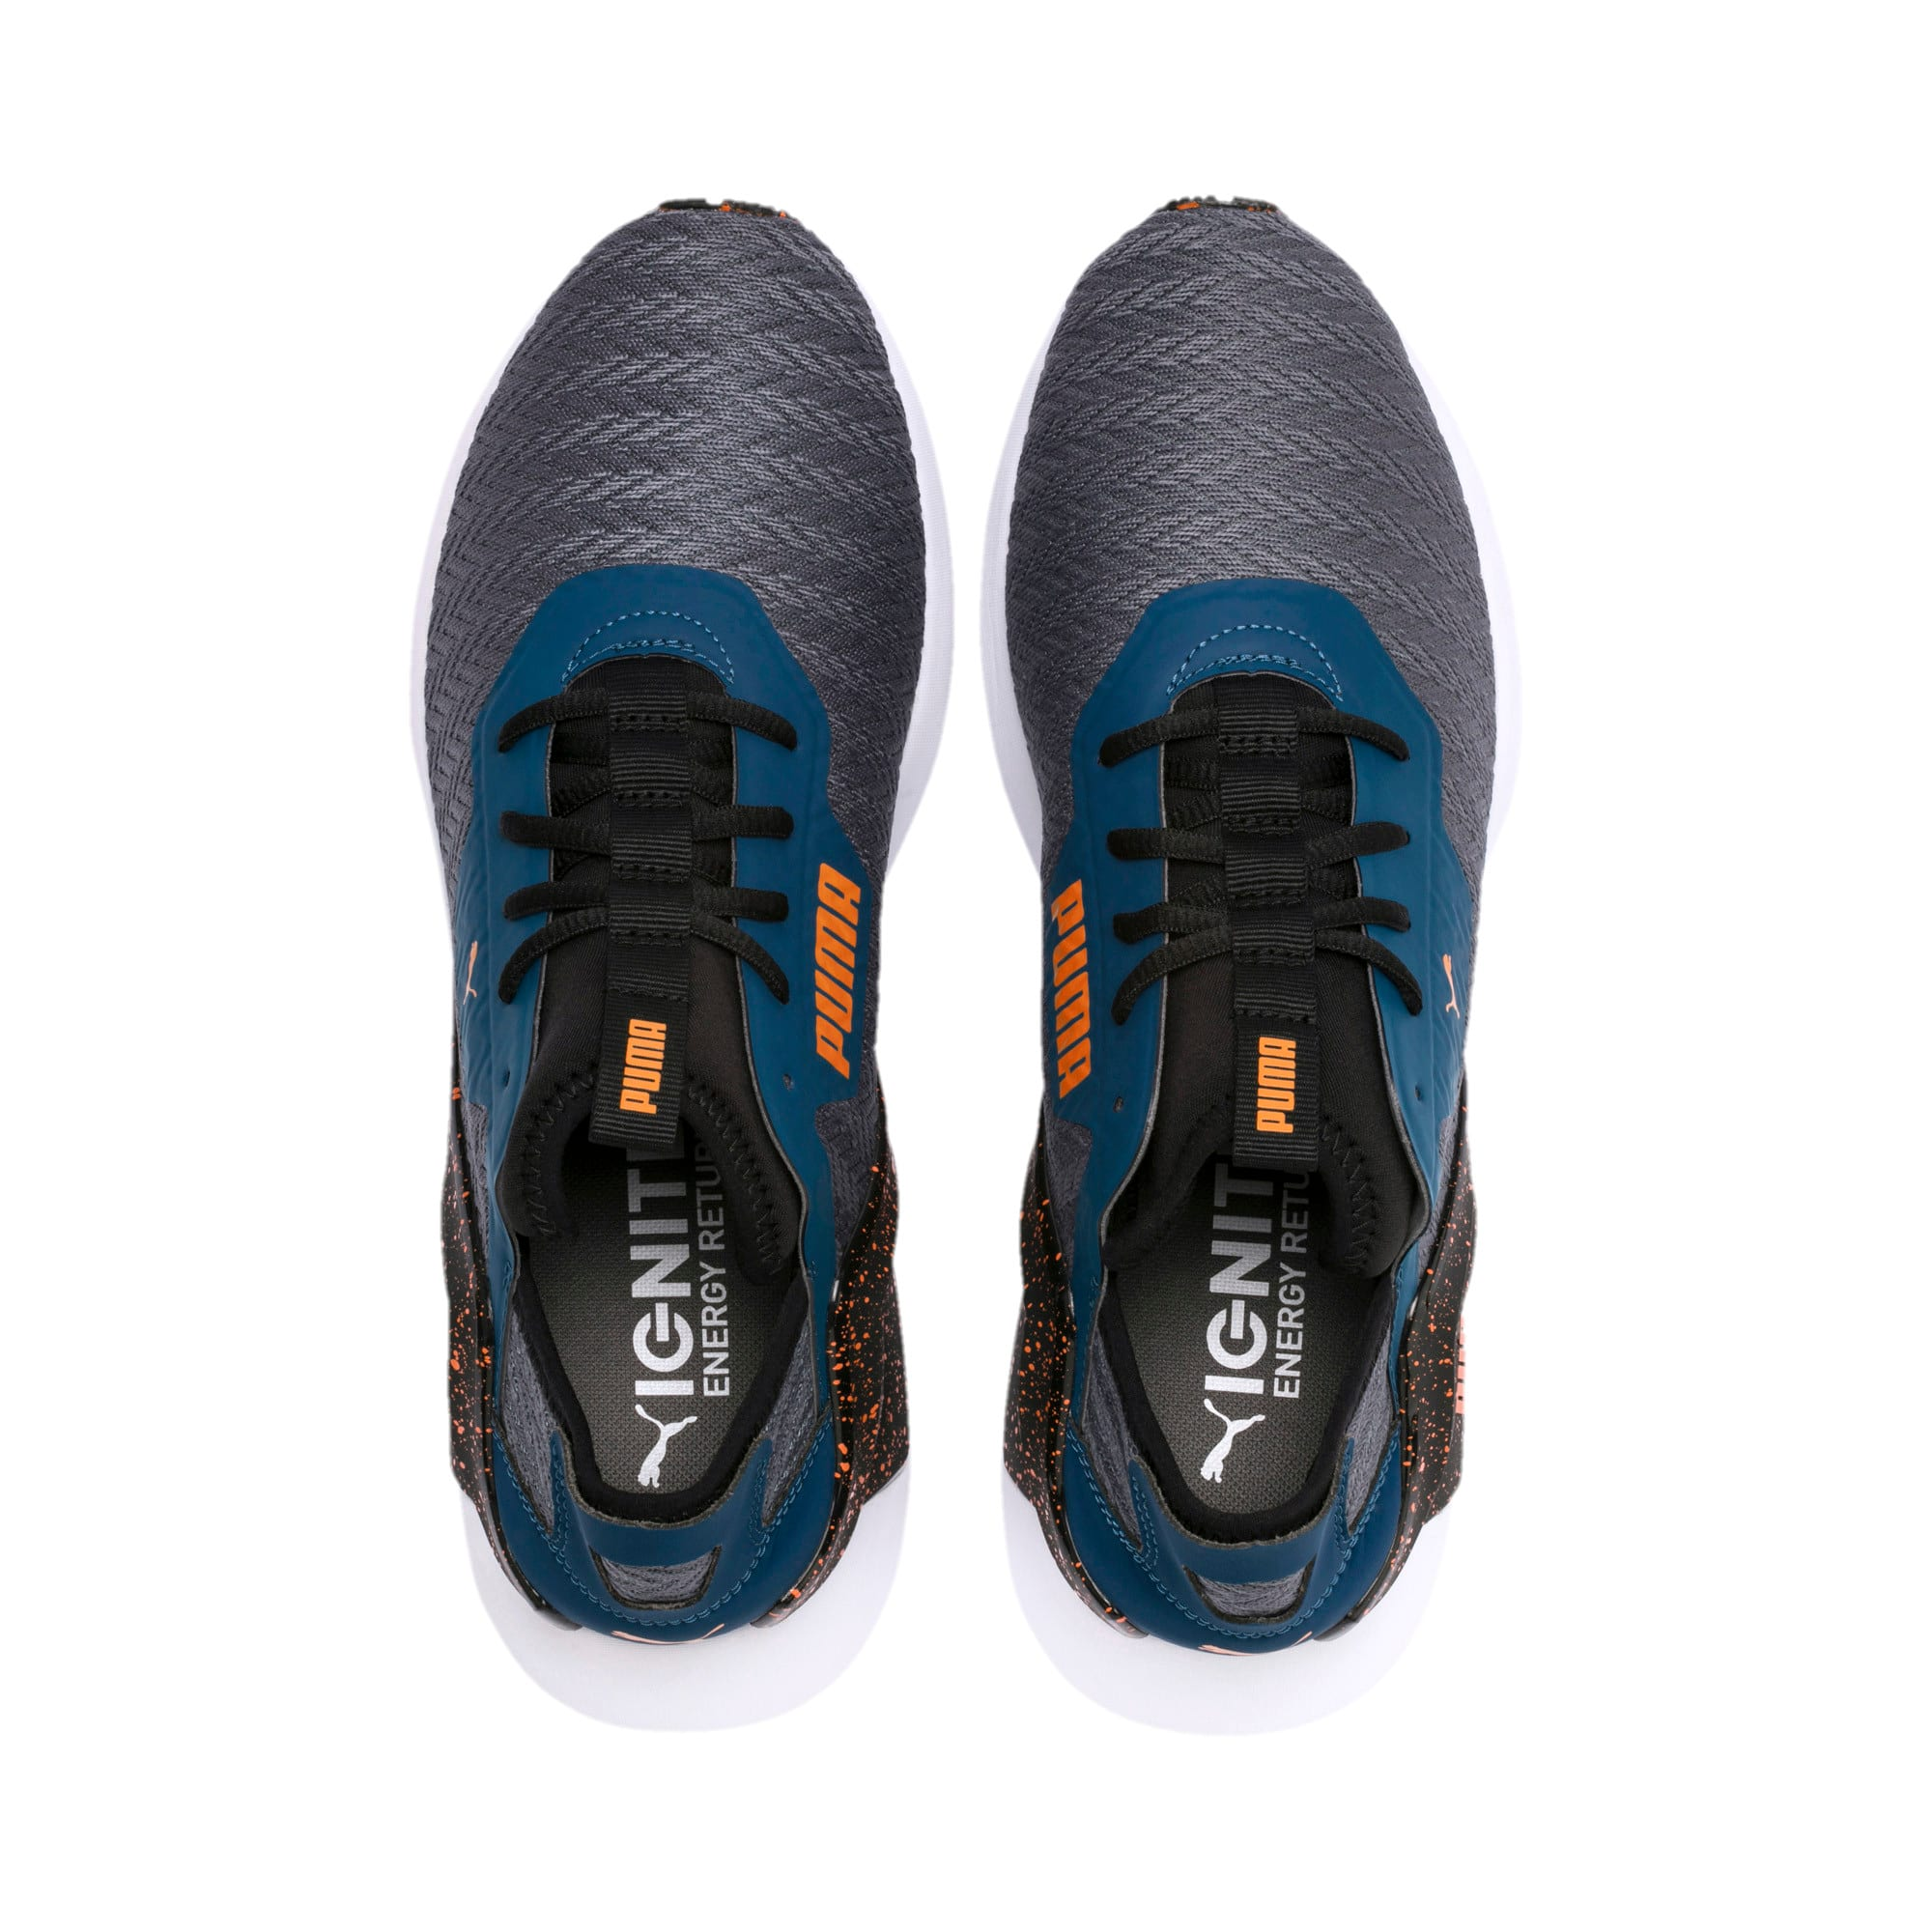 Thumbnail 7 of Rogue X Terrain Men's Training Shoes, CASTLEROCK-Gibr Sea-J Orange, medium